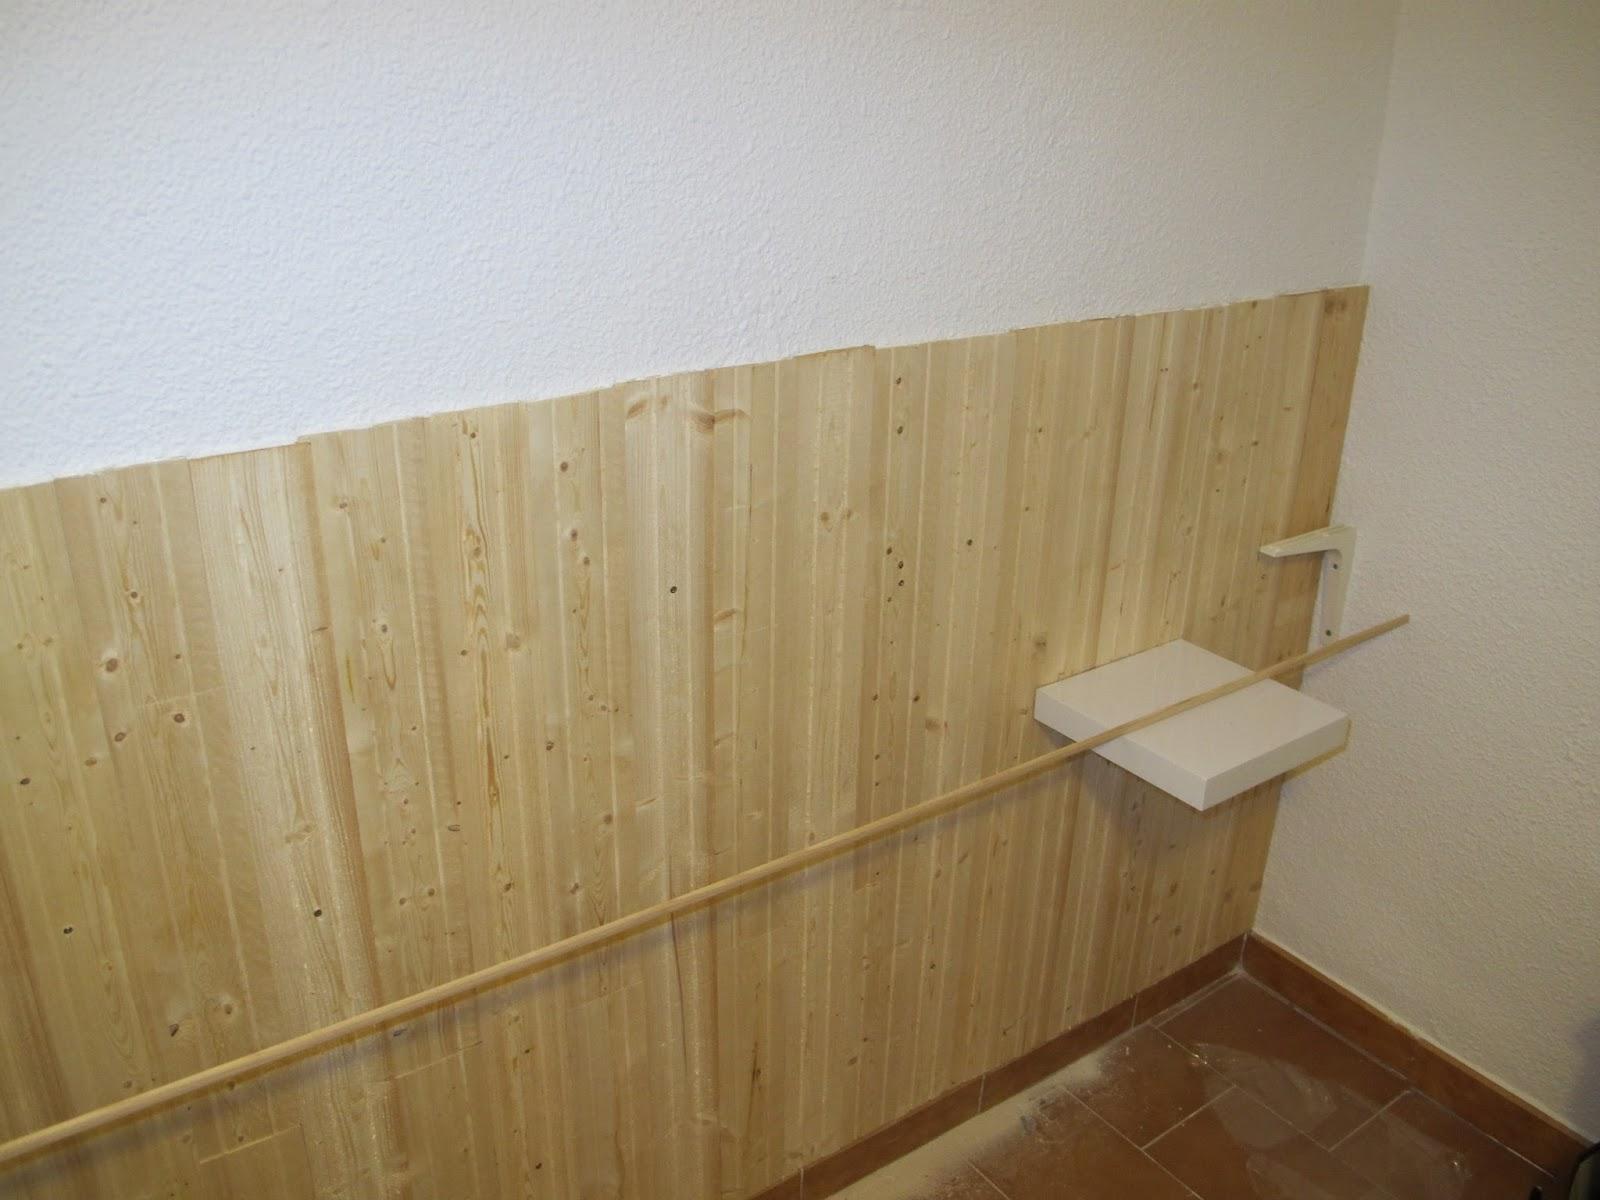 Bricomonxo cabecero de madera para dormitorio - Colocar friso en pared sin rastreles ...